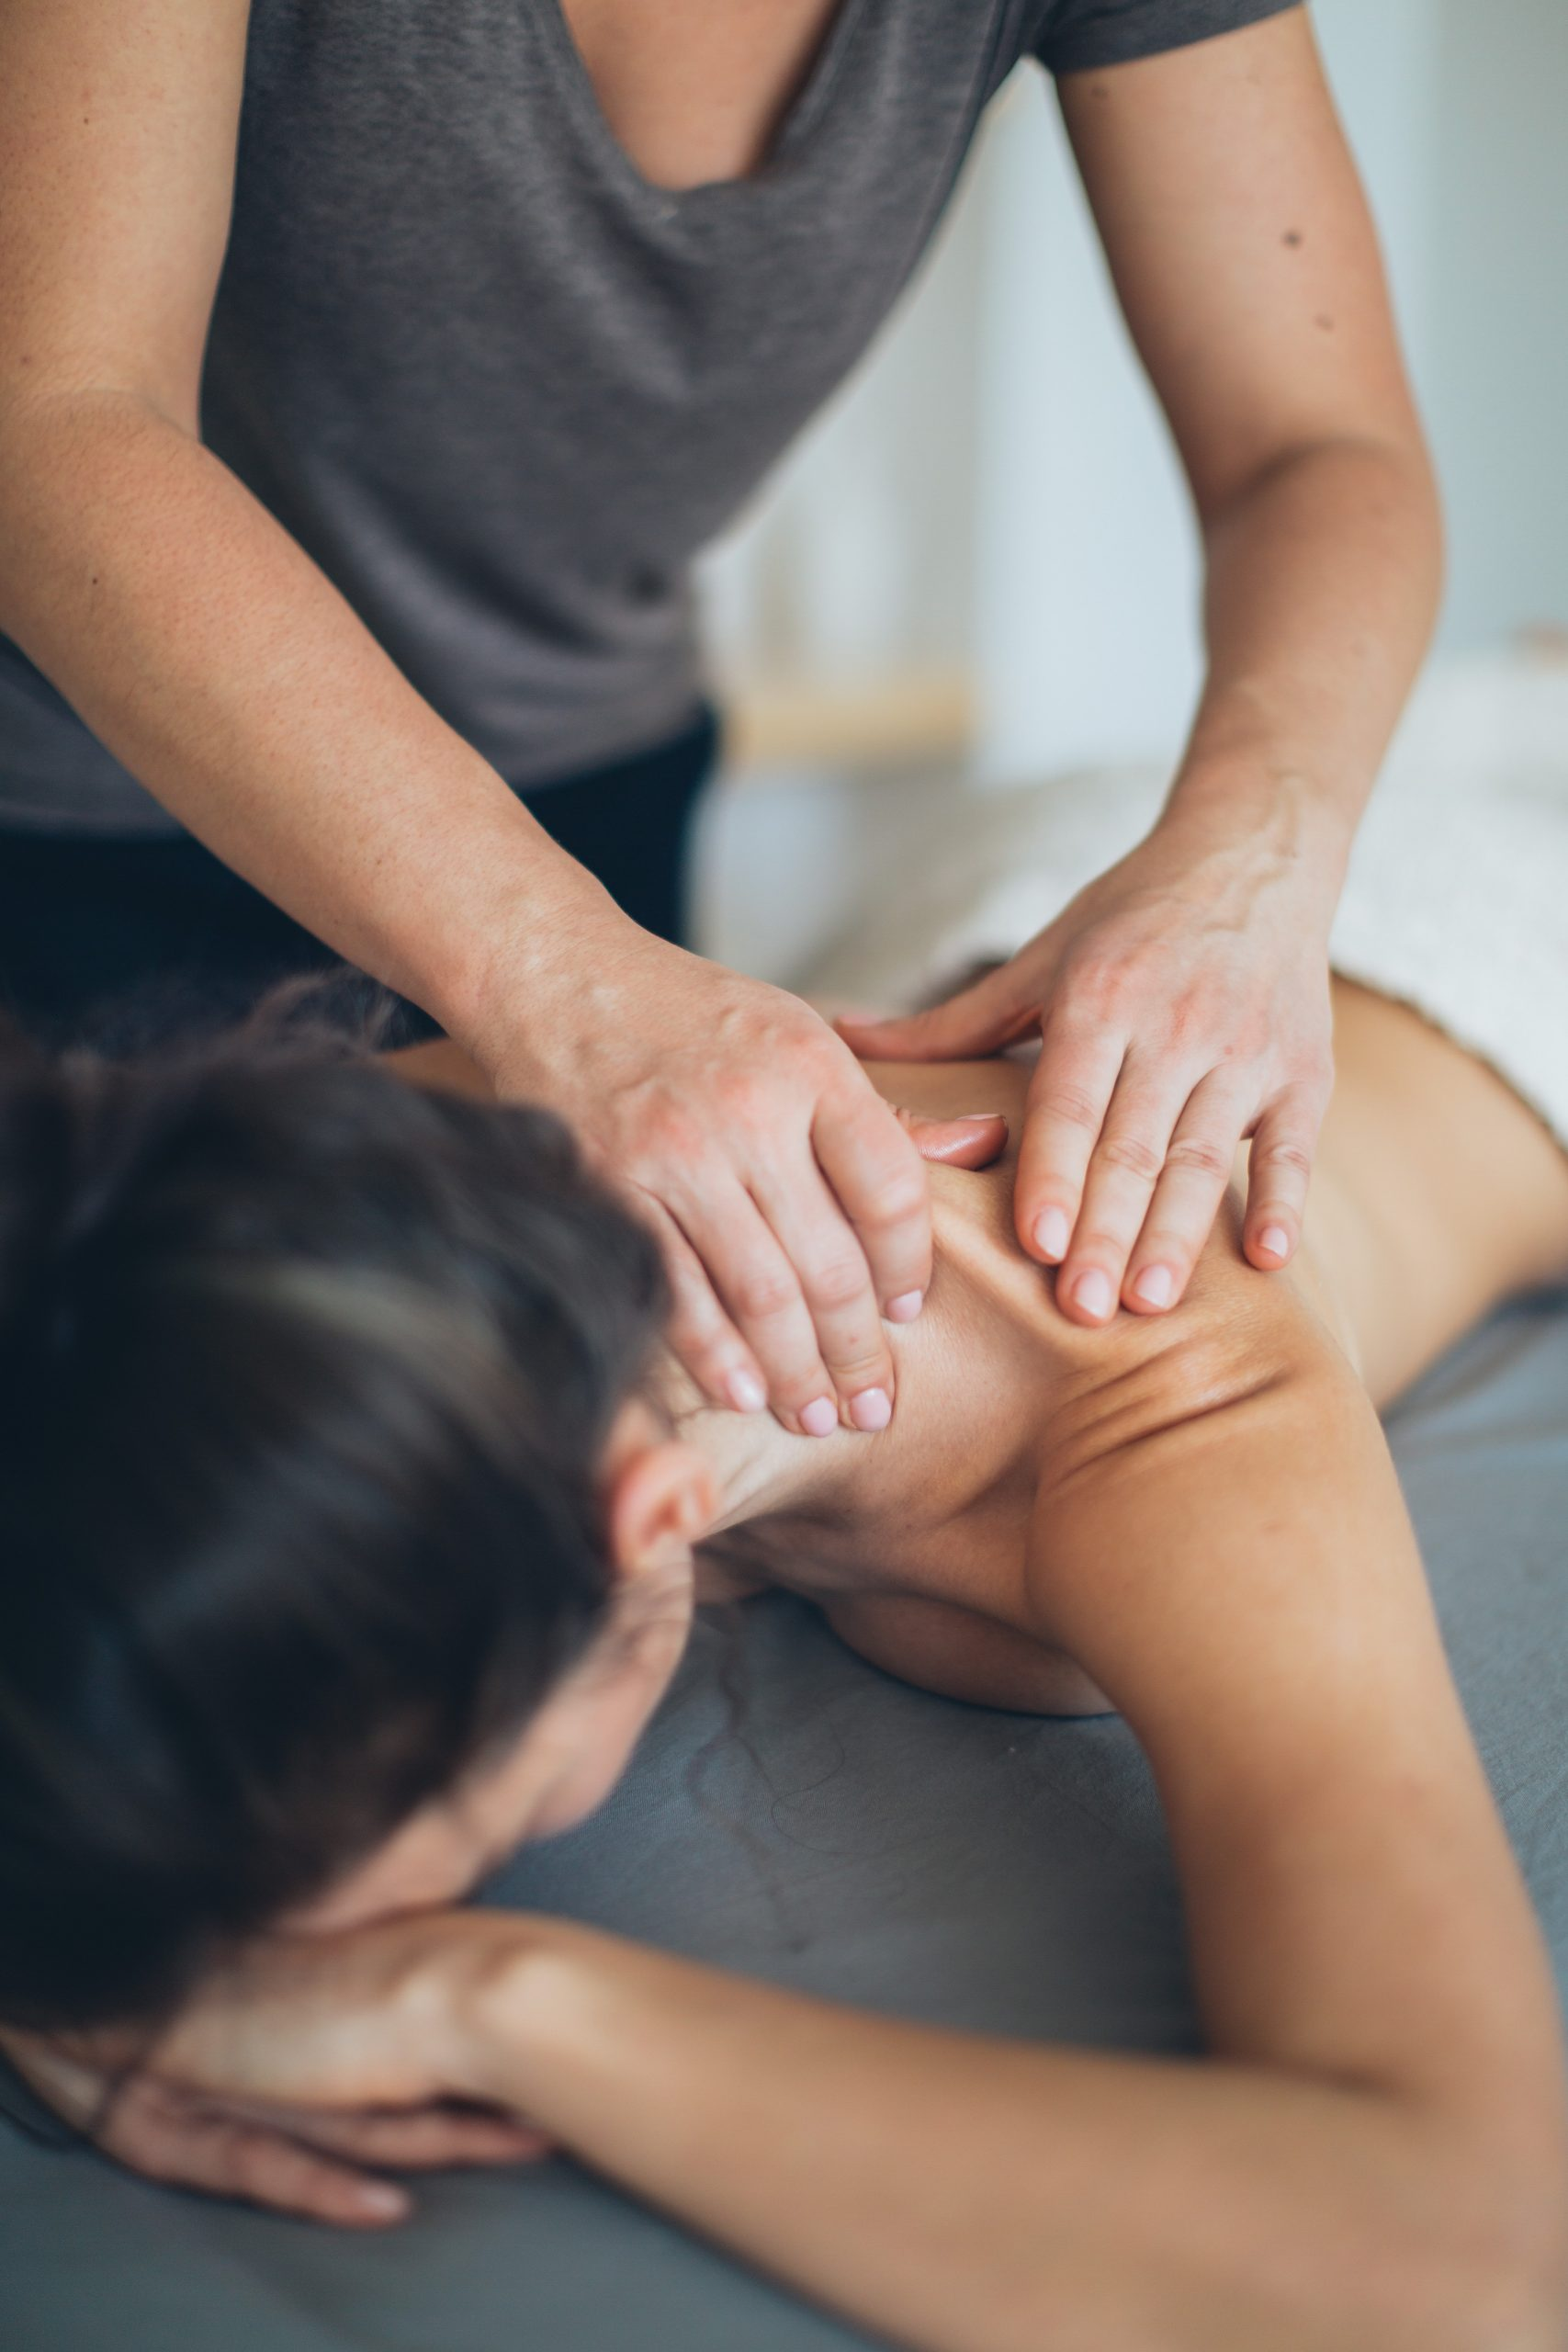 massage-session-3865799